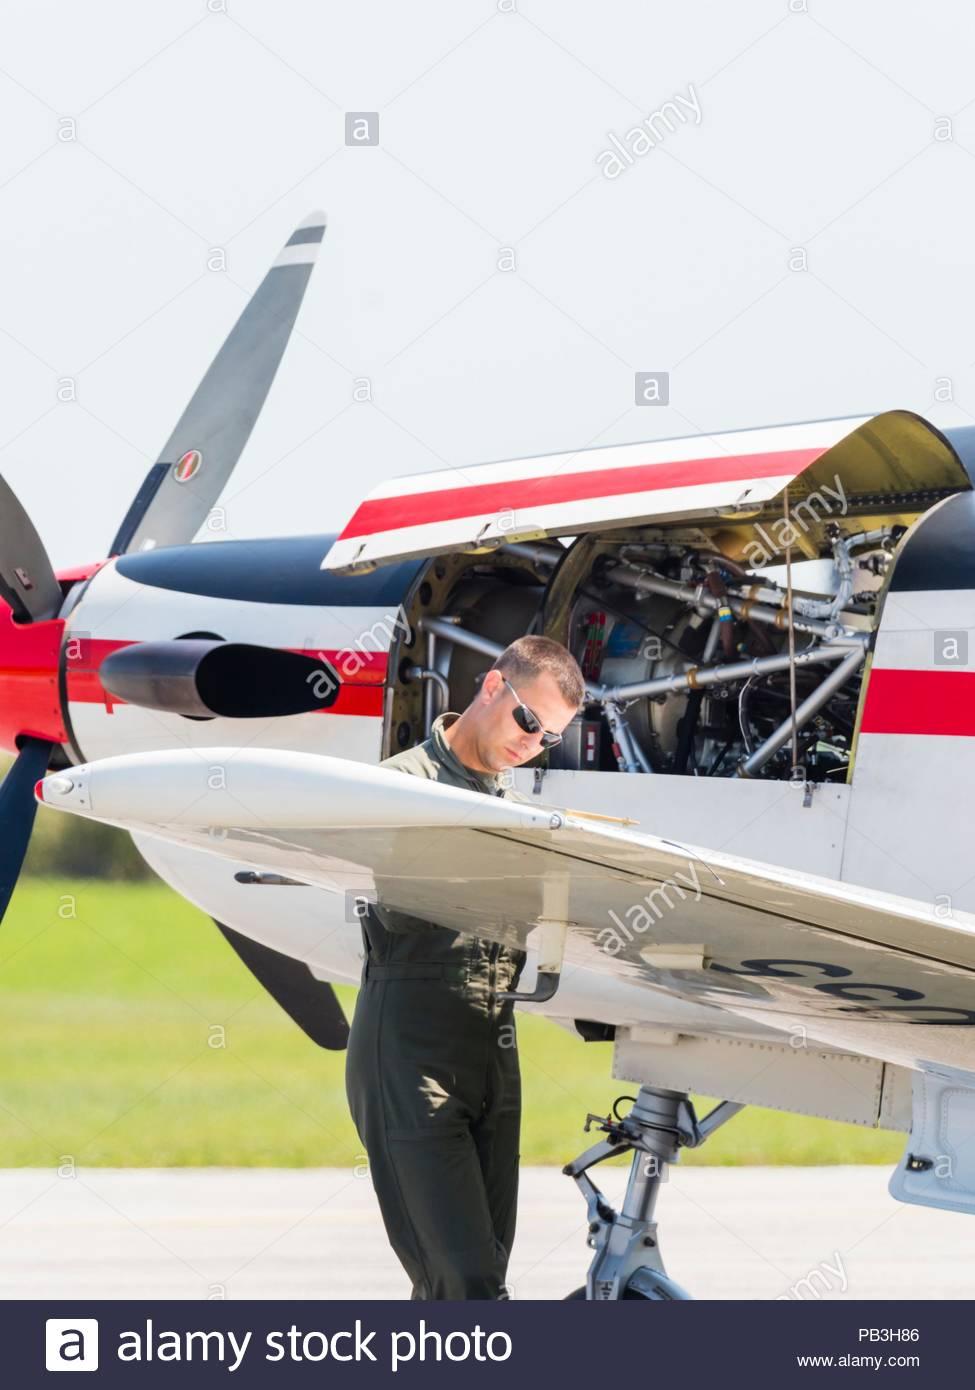 Krila oluje aerobatic group from CroatiaStock Photo